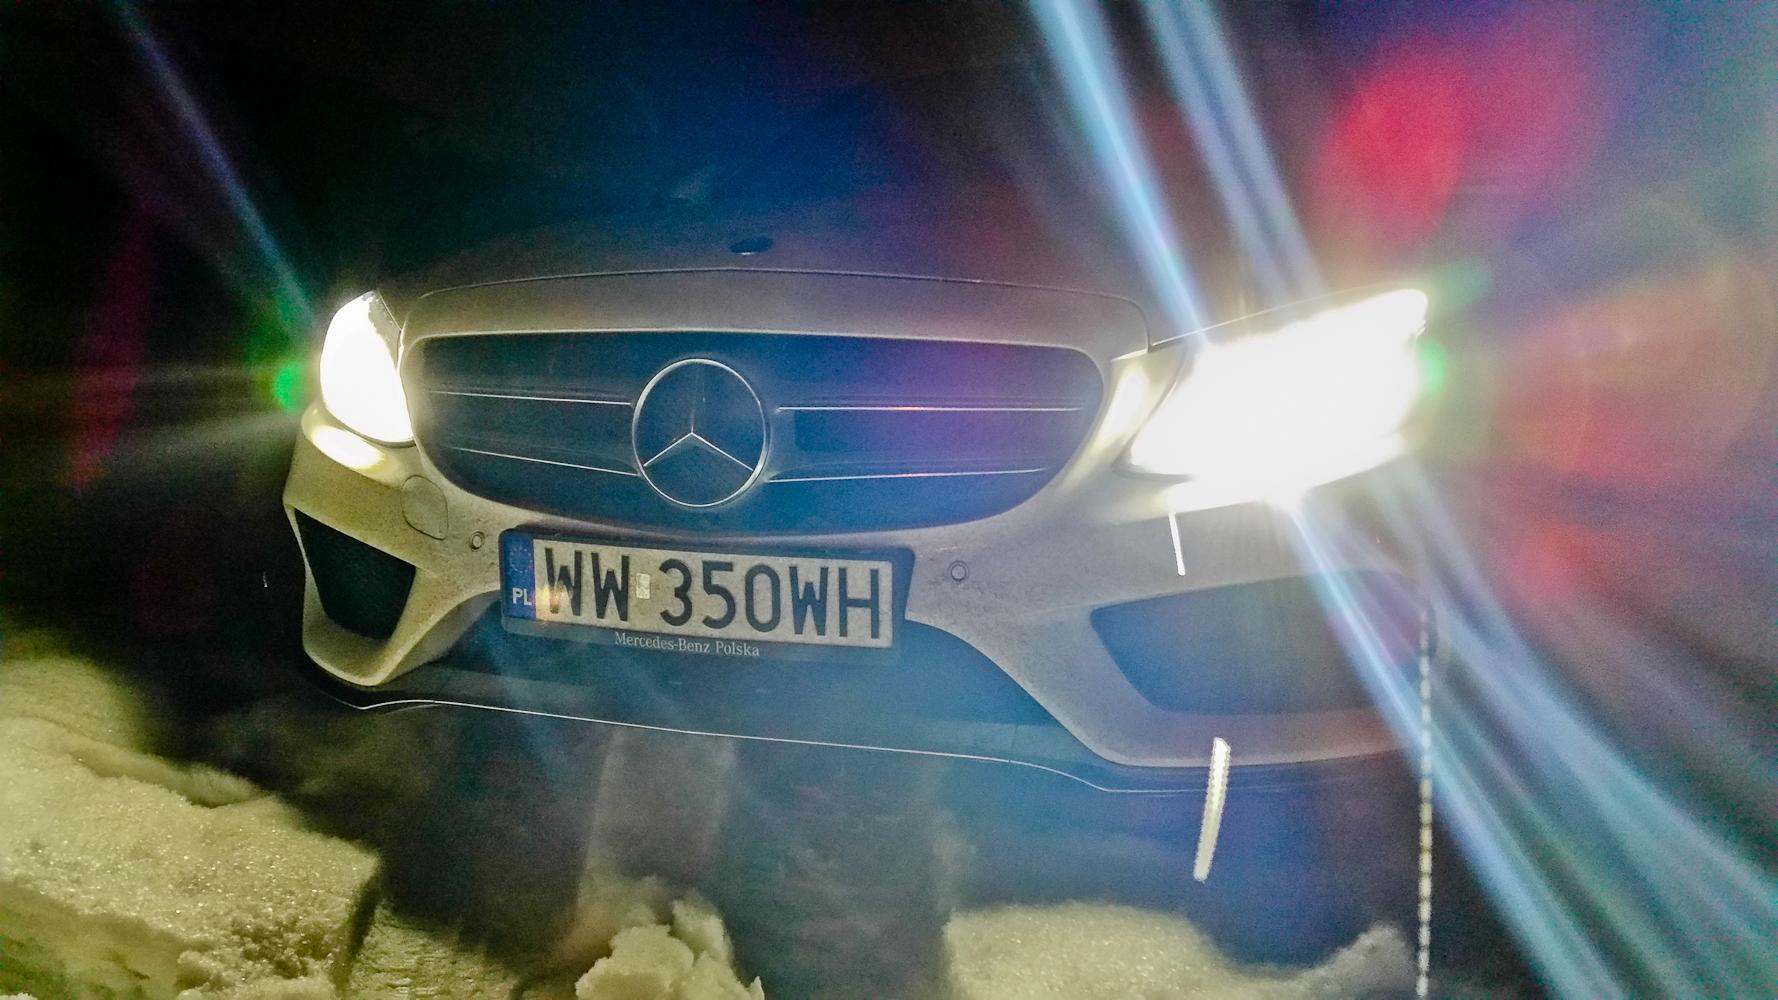 Mercedes C200. Spokojny wariat